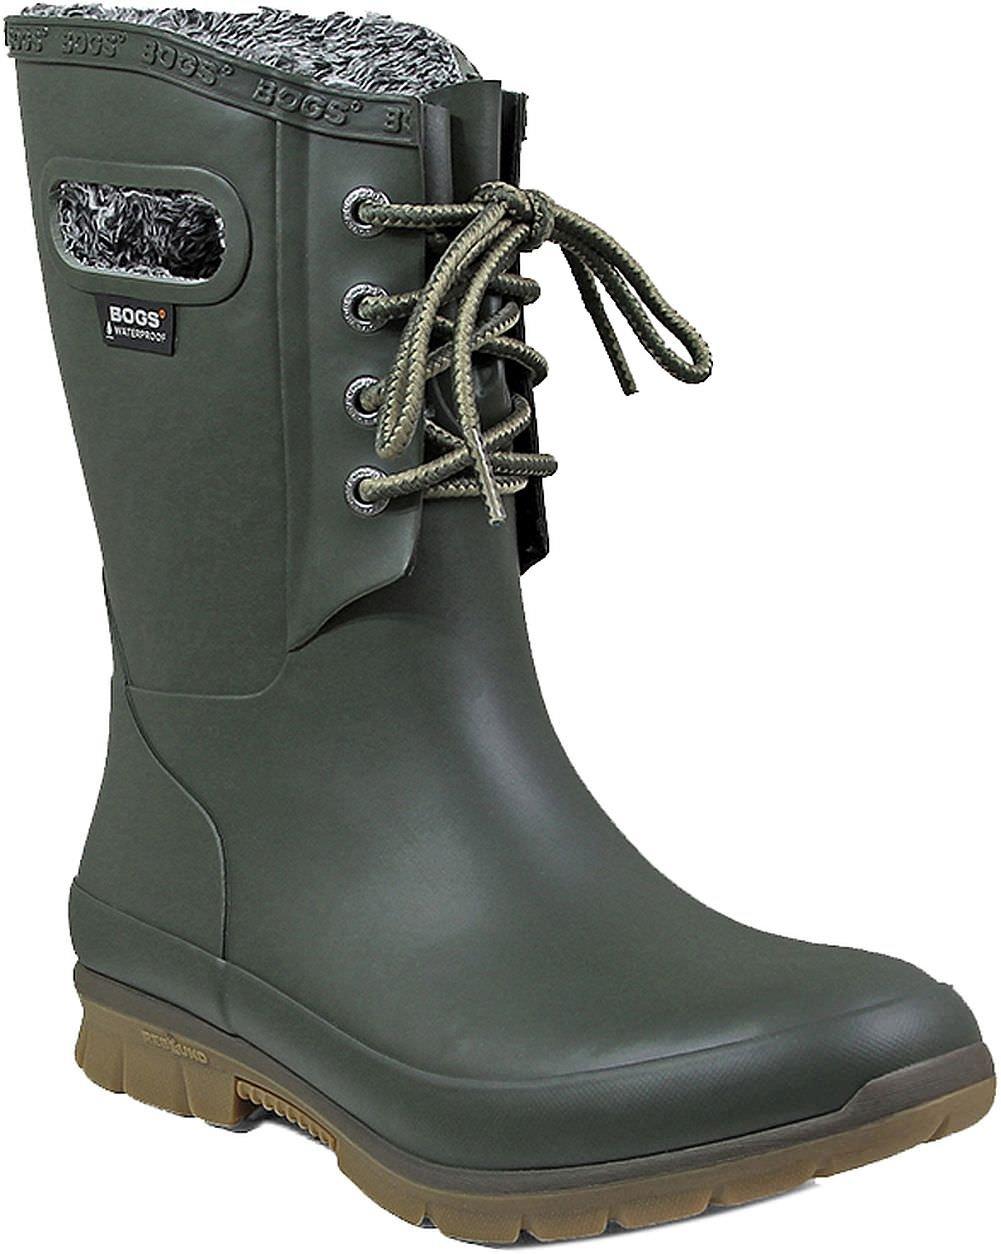 Bogs Women's Amanda Plush Snow Boot, Dark Green, 6 M US